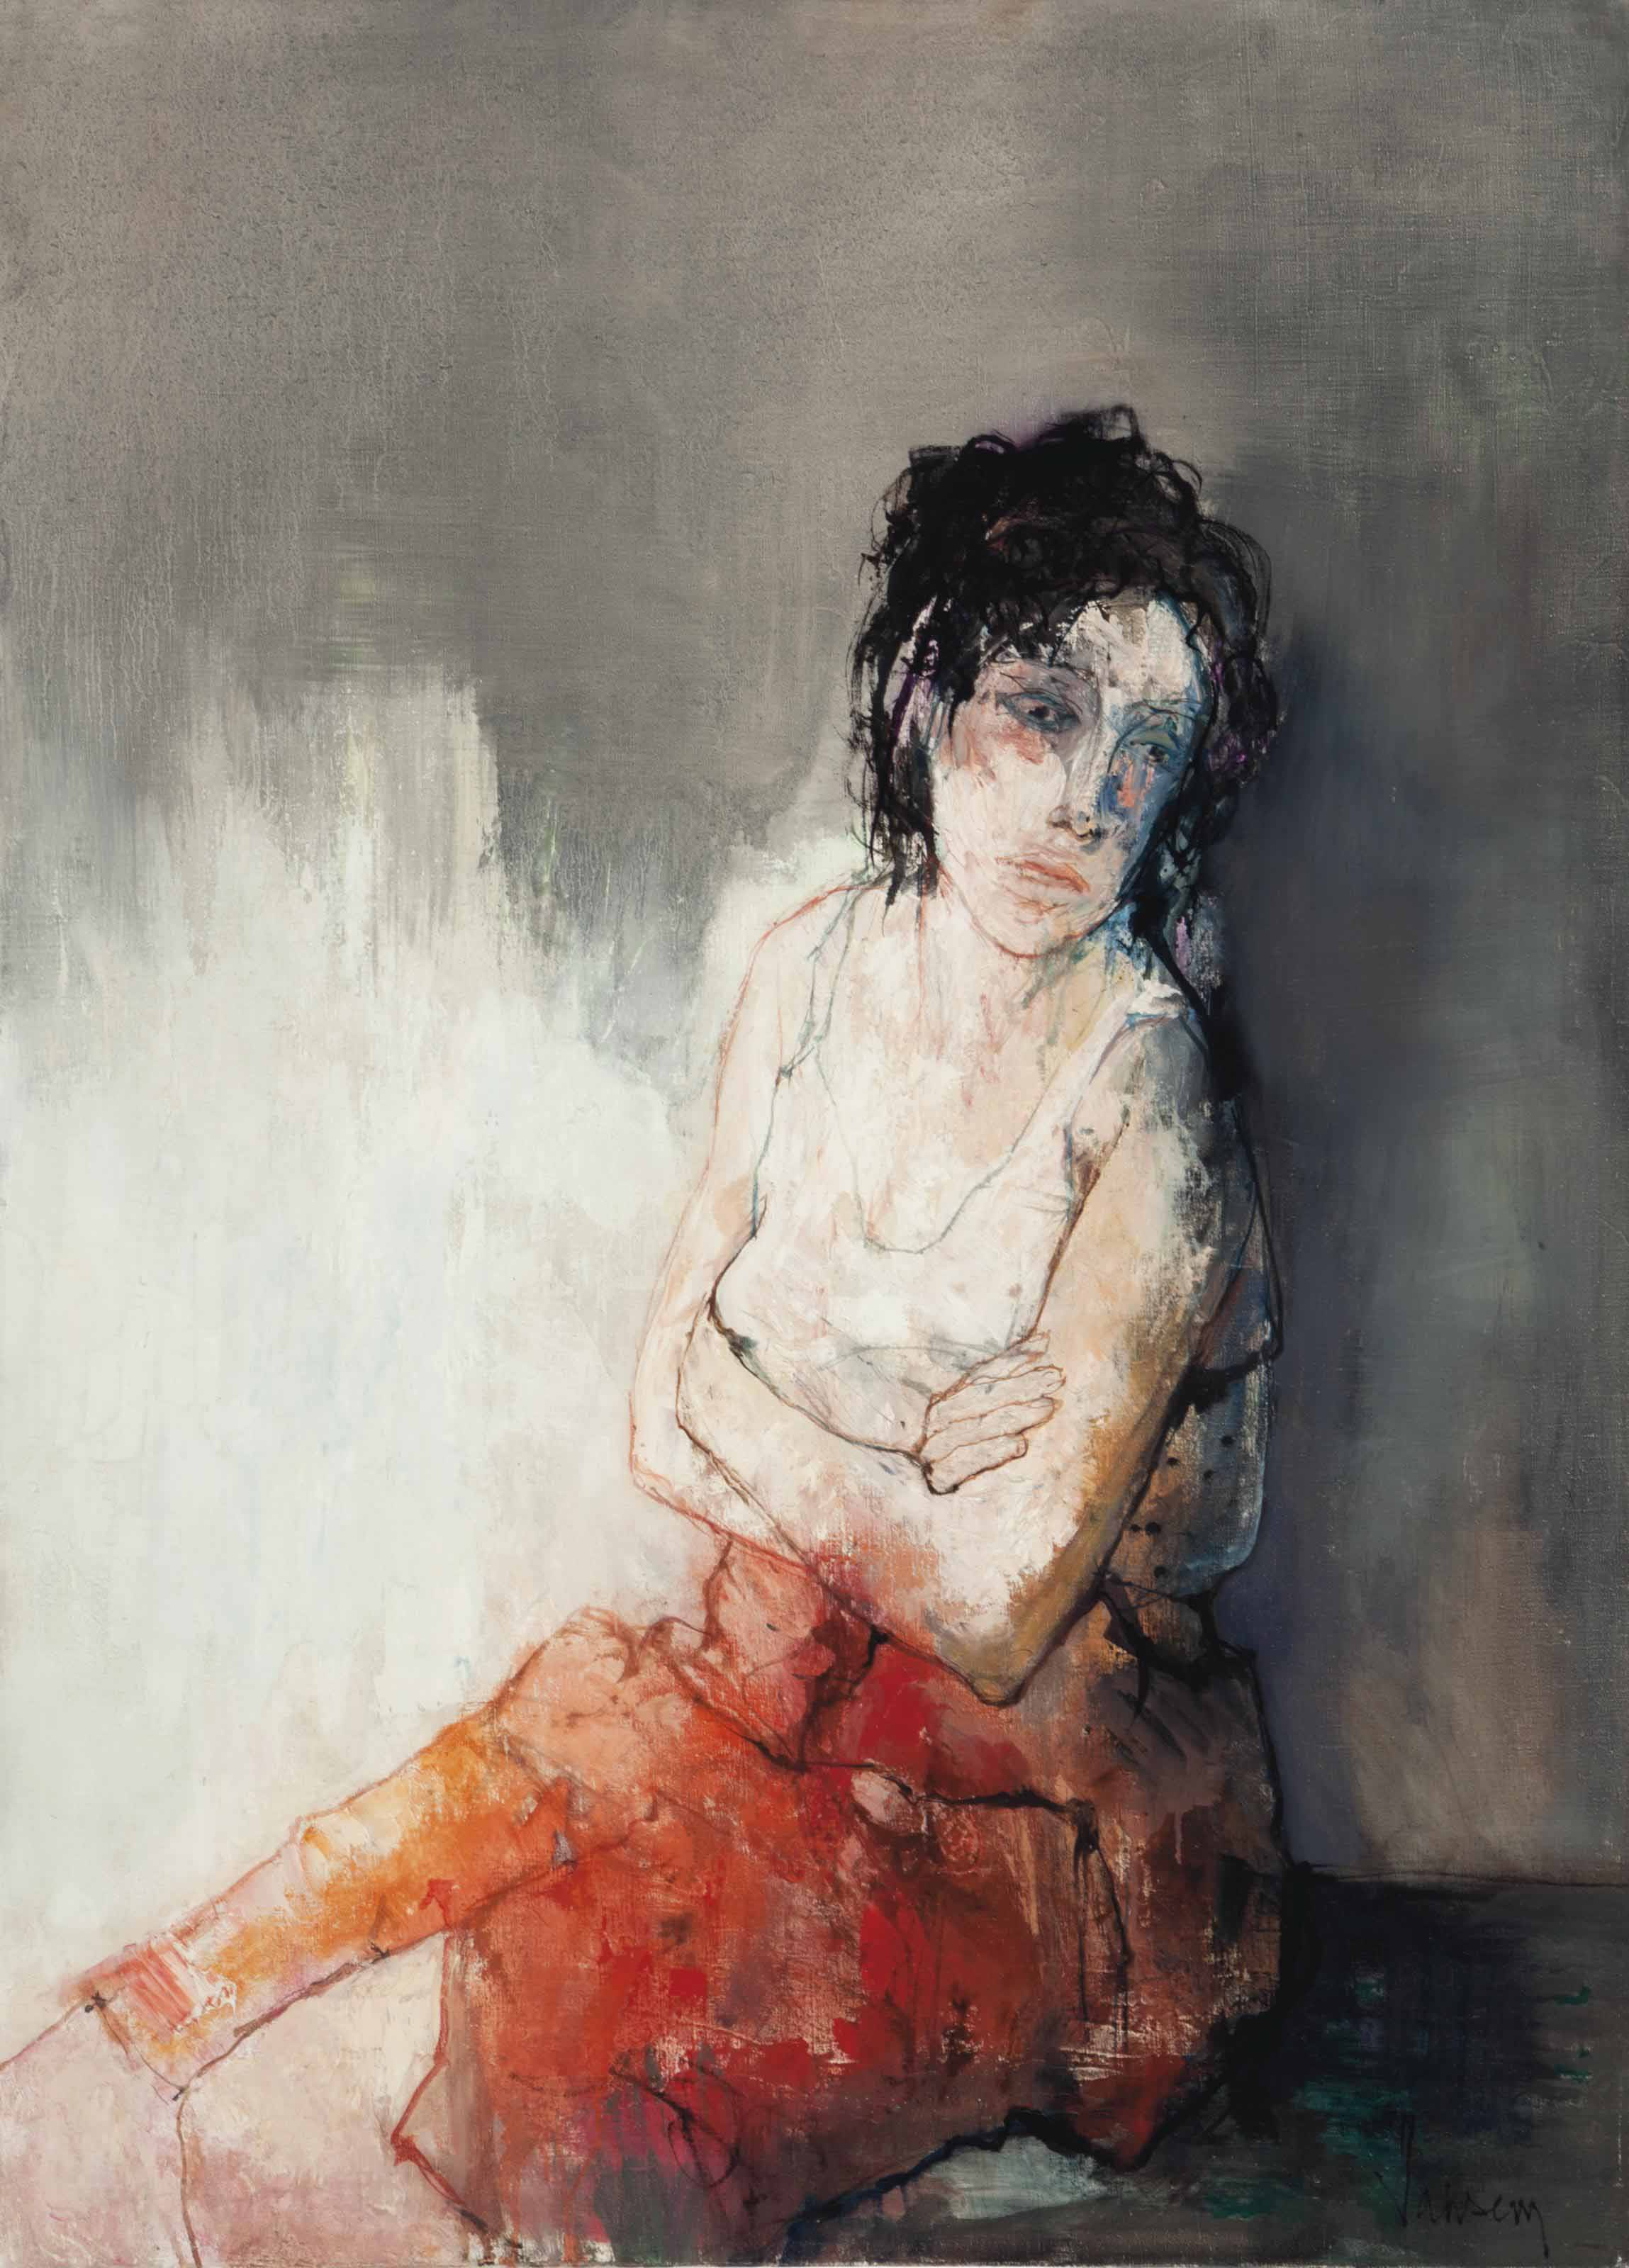 Jean Jansem (French, 1920-2013